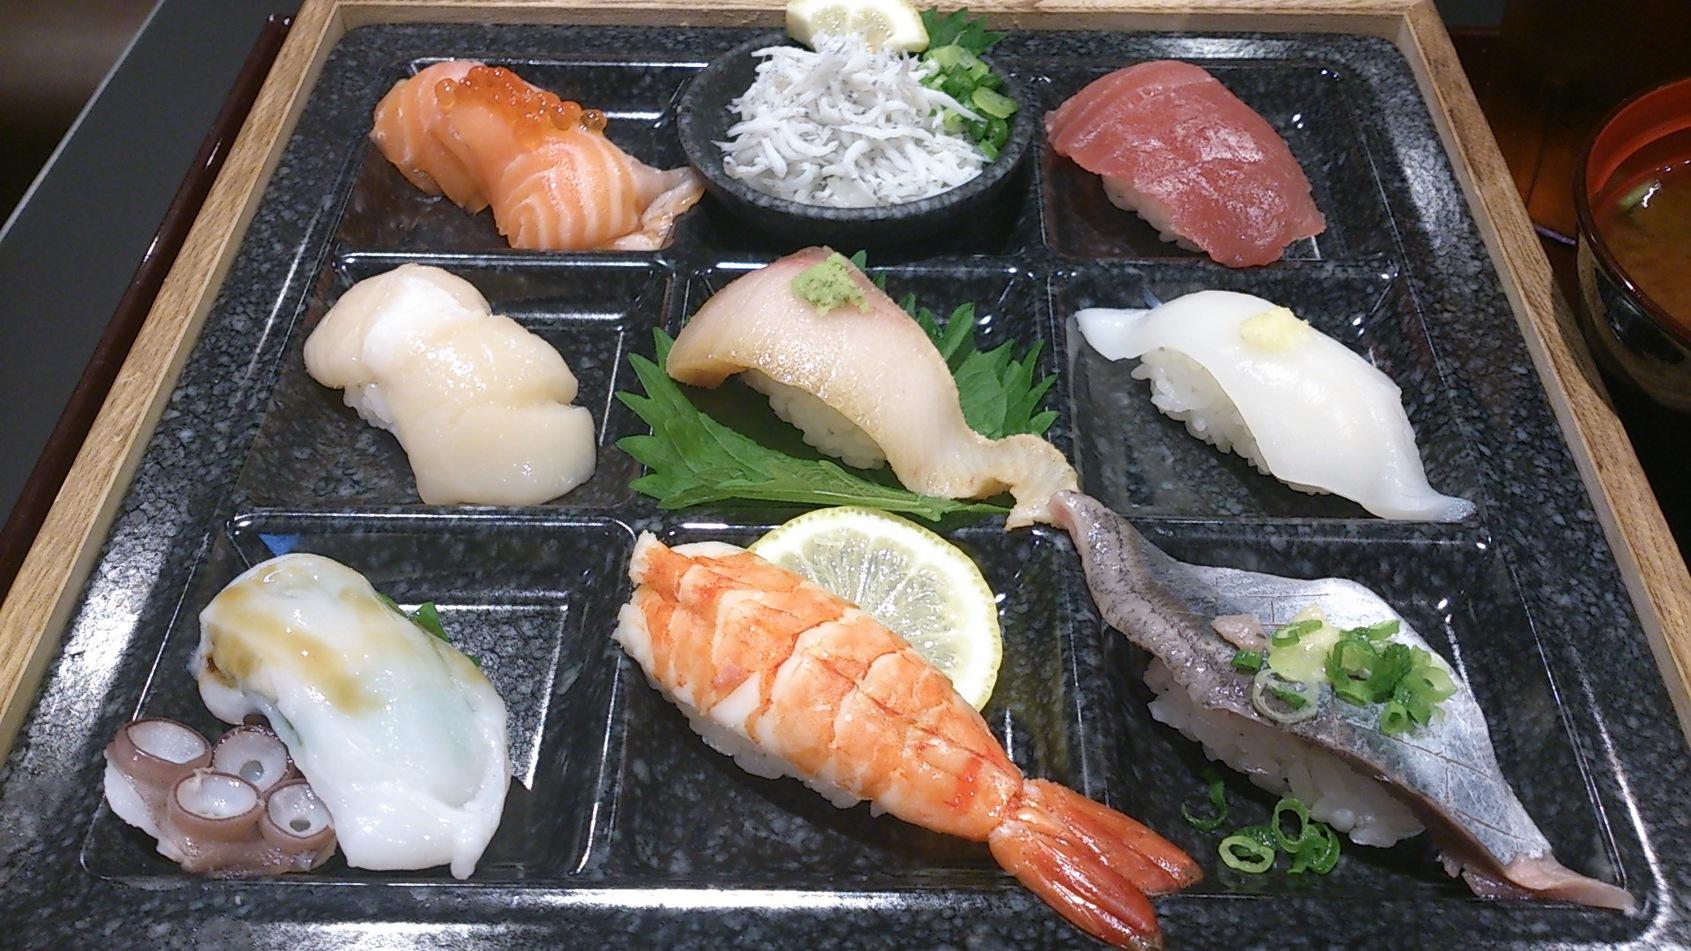 海鮮寿司 北海素材 イオンモール京都桂川店